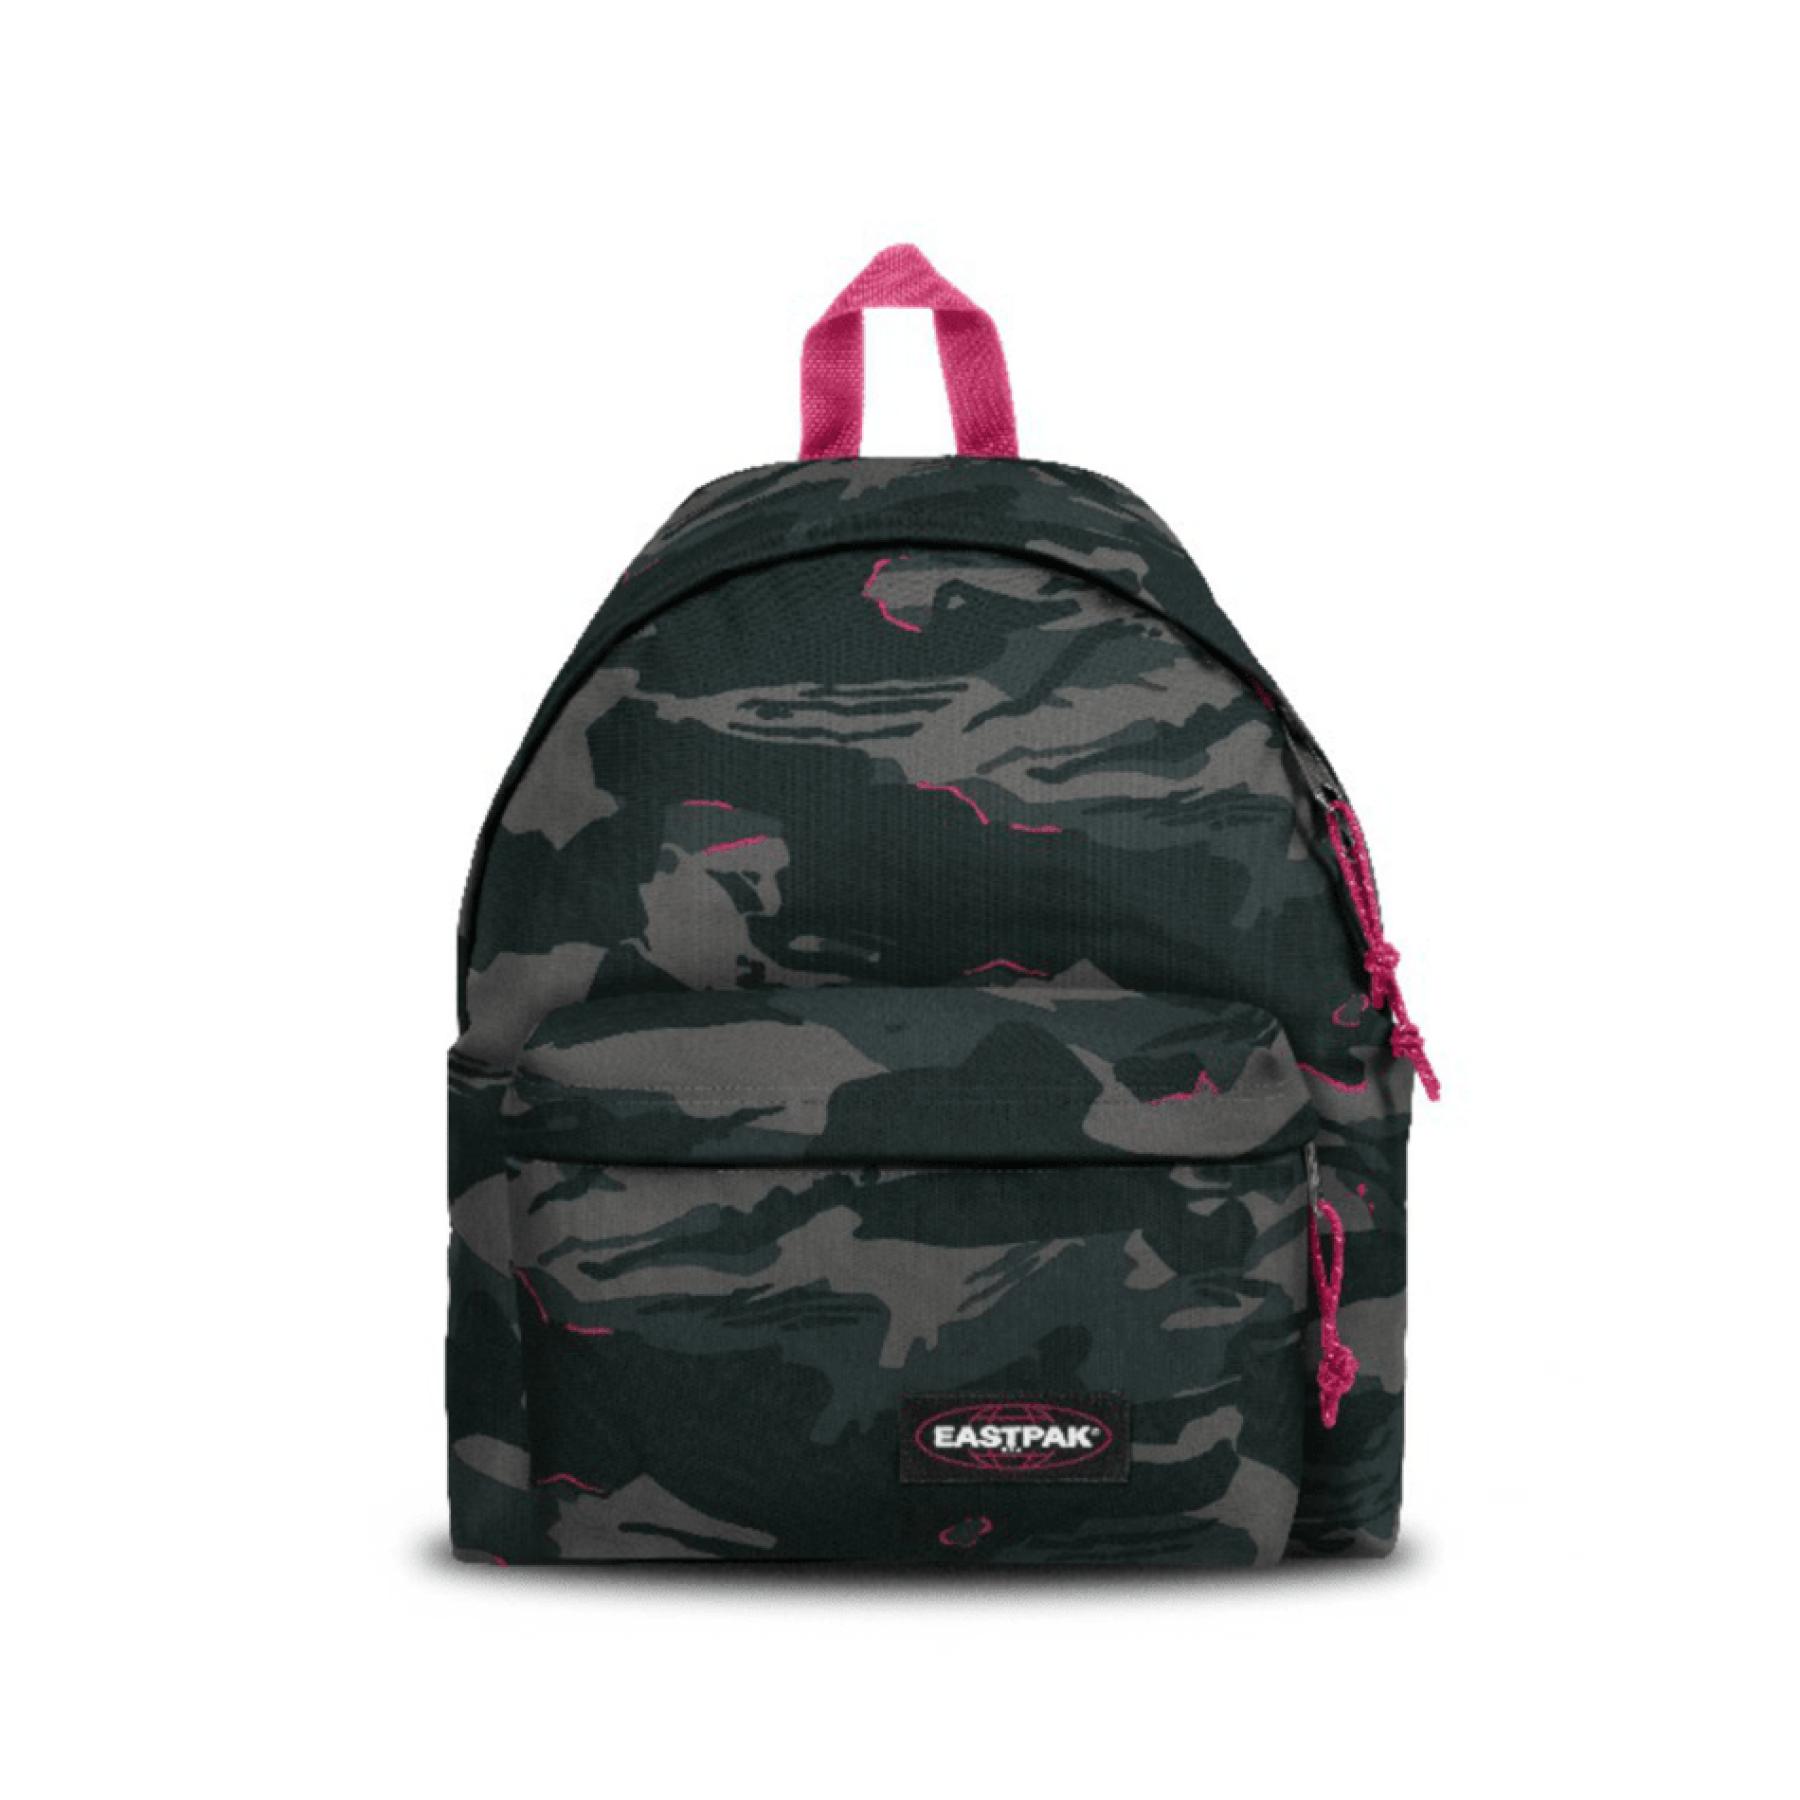 Bag Eastpak Padded Pak'r